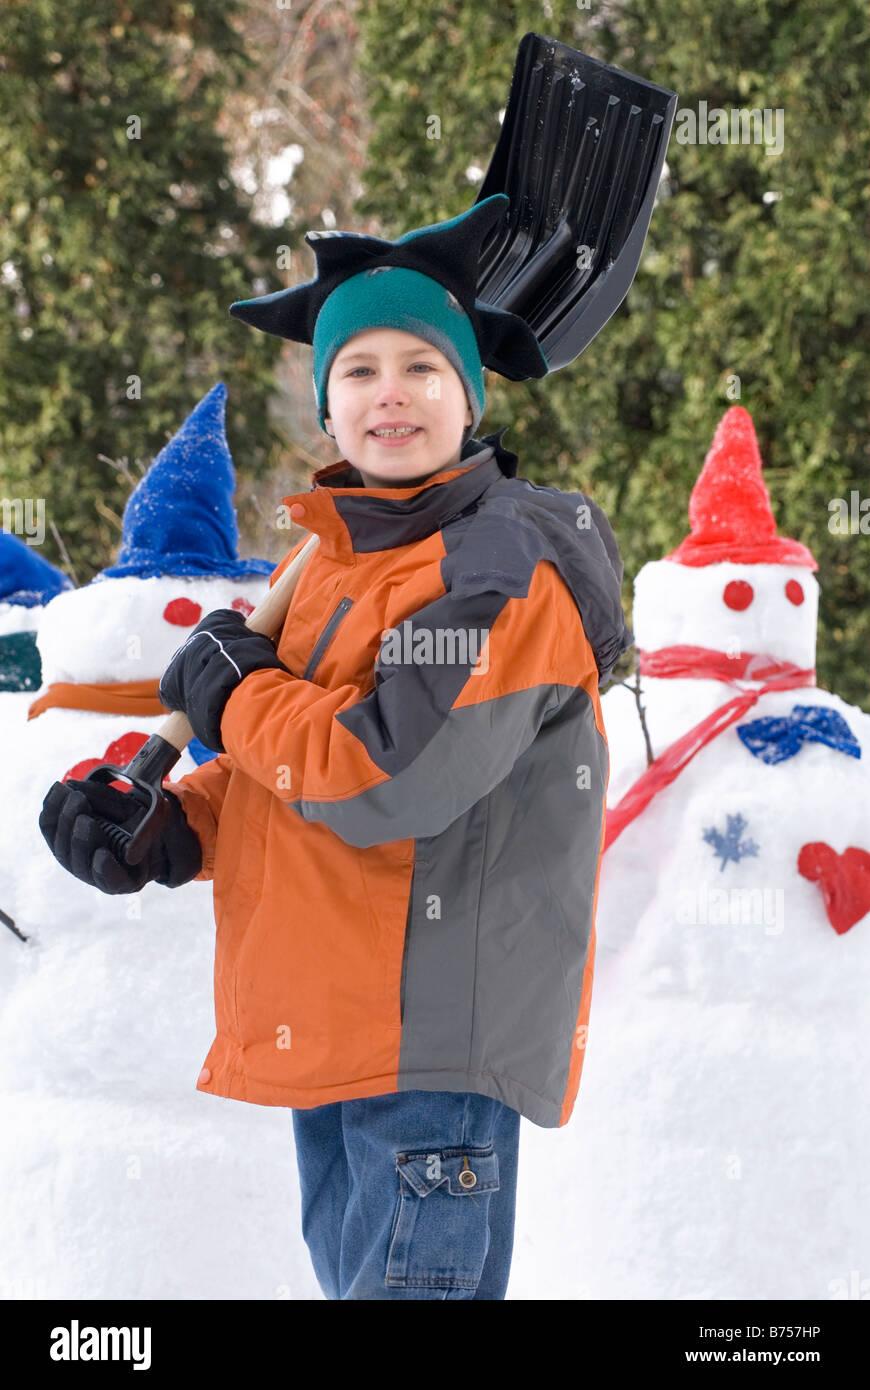 Ten year old boy with shovel beside snowmen, Winnipeg, Canada - Stock Image